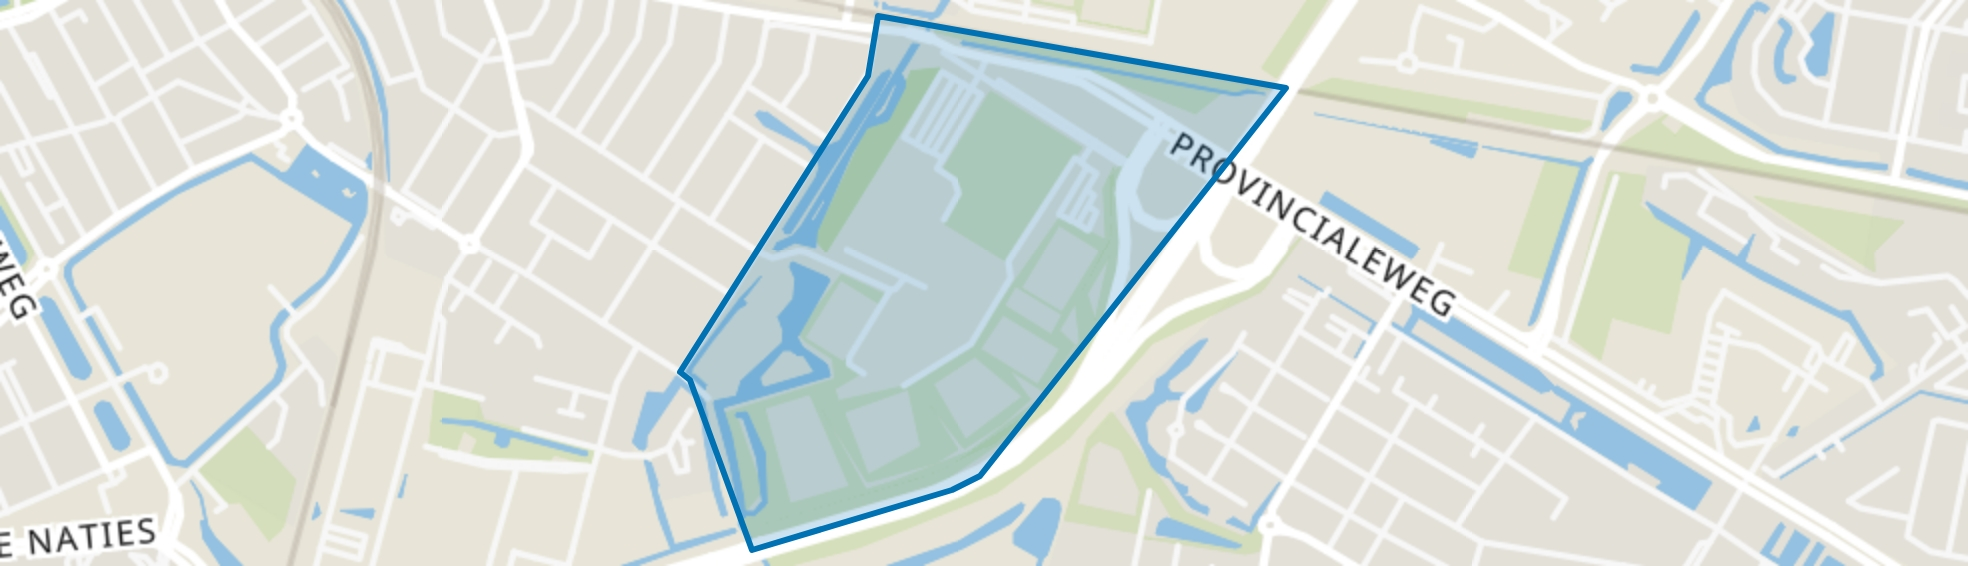 Sportterrein Krommedijk, Dordrecht map